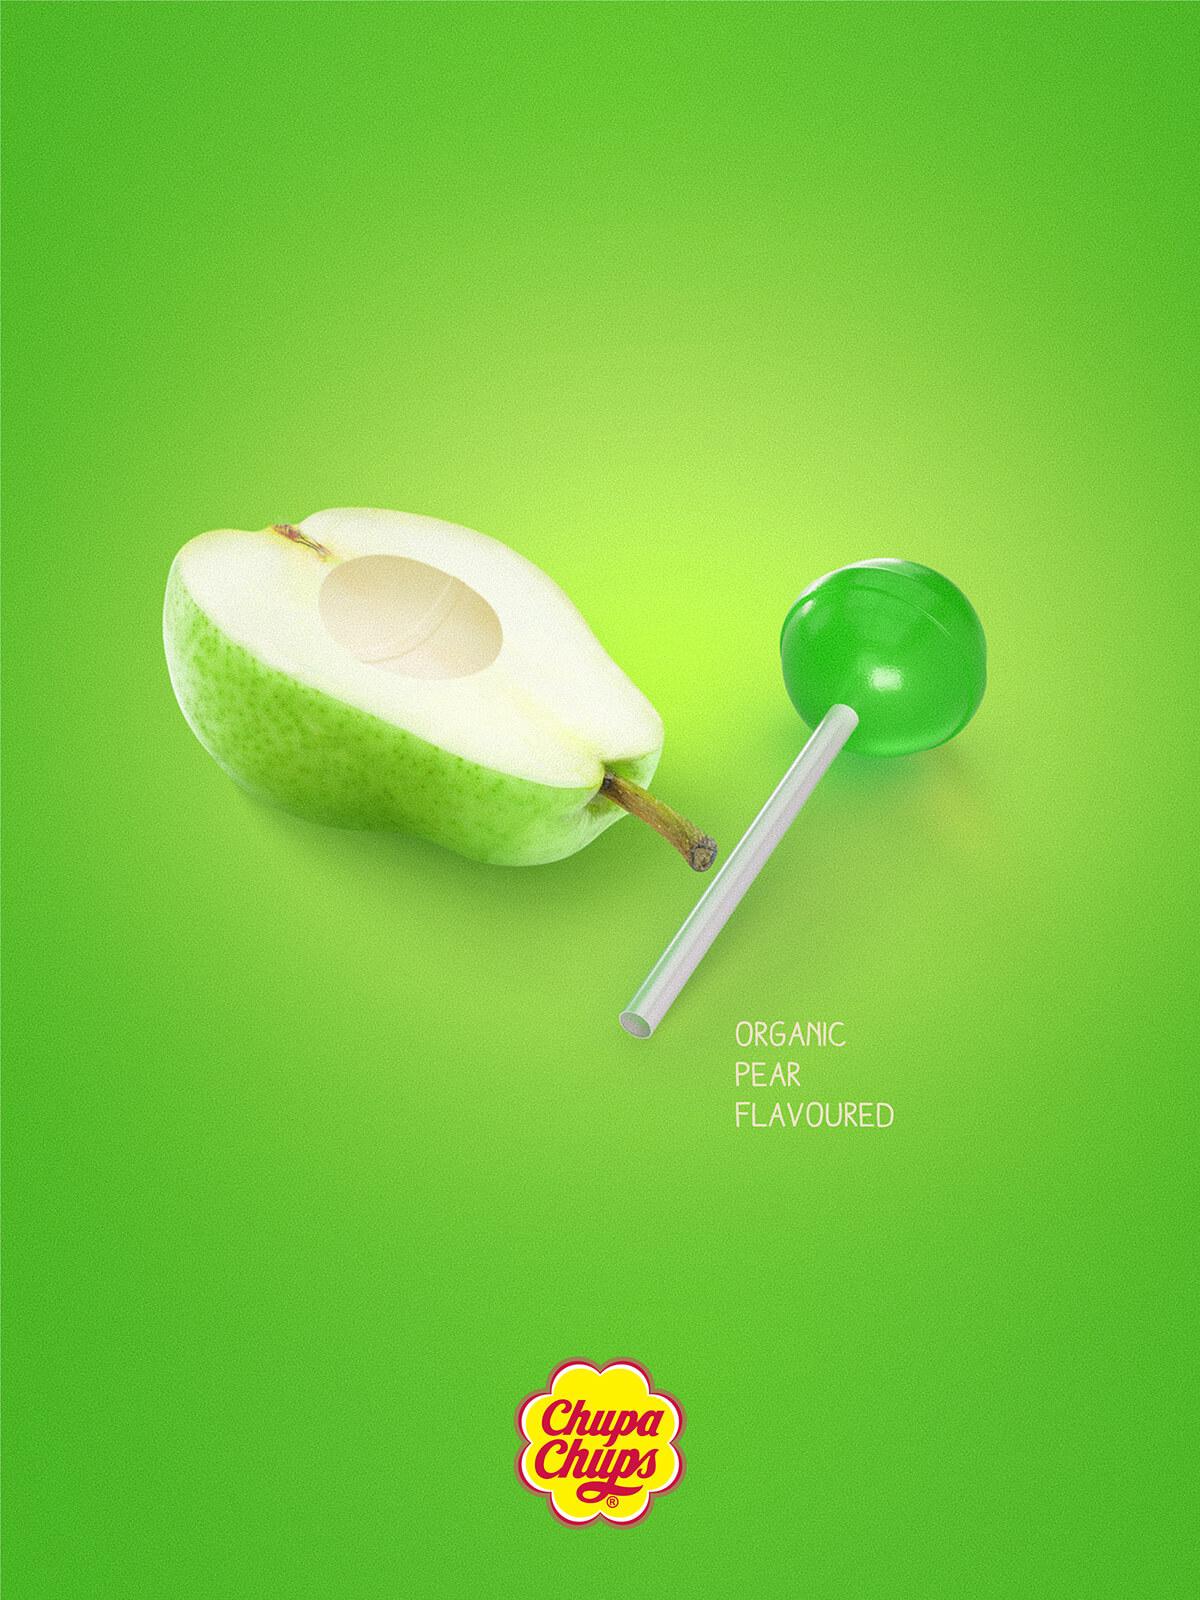 Organic flavoured - Chupa Chups print